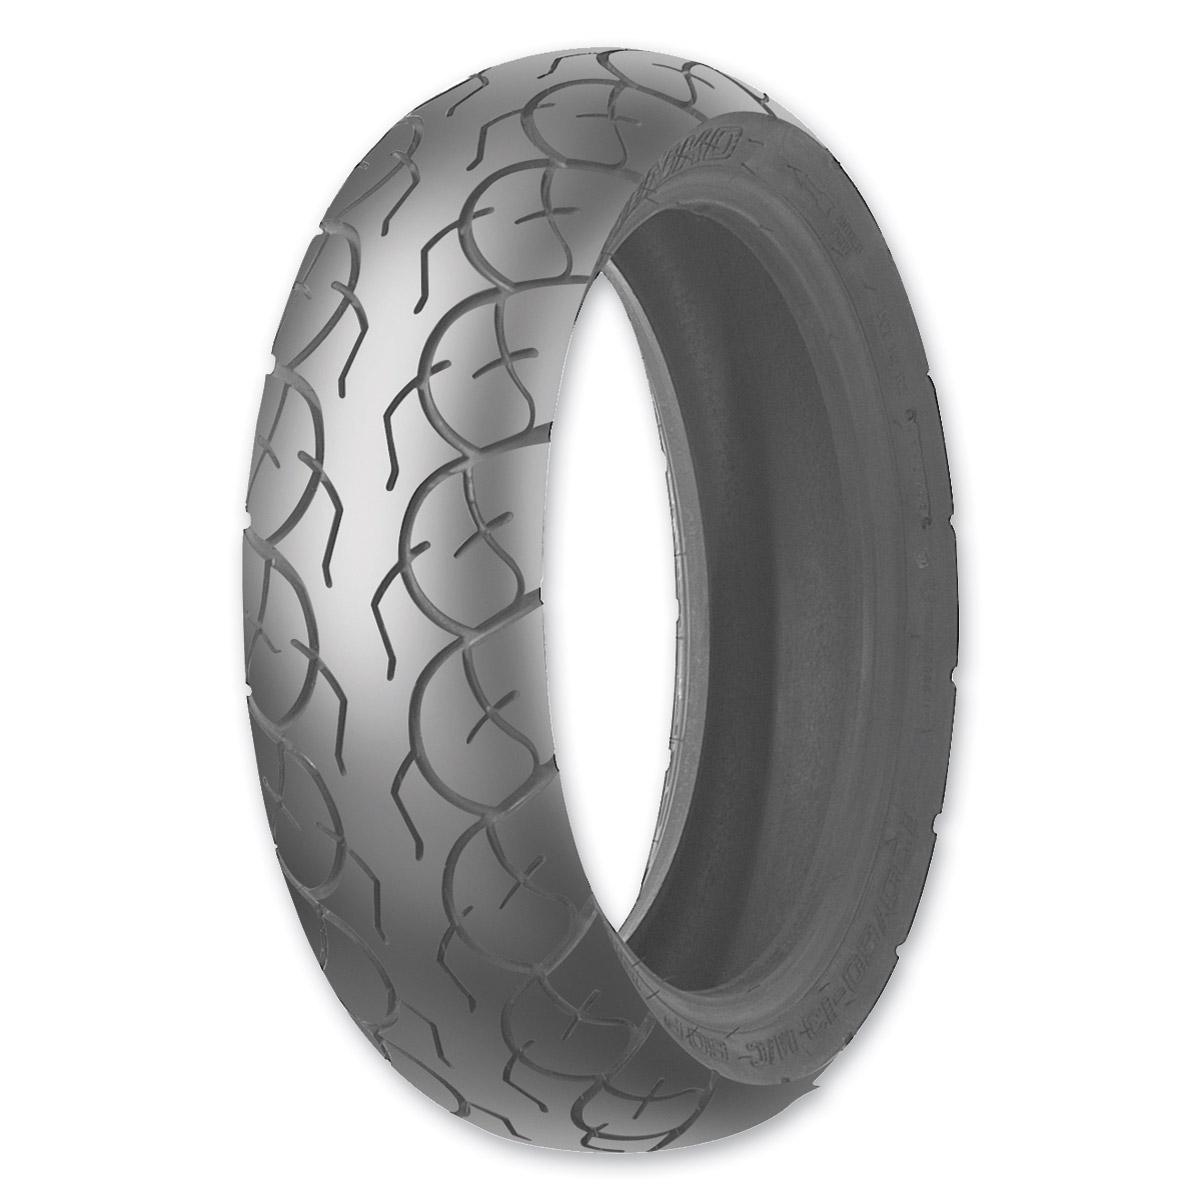 Shinko SR568 100/80-16 Rear Tire